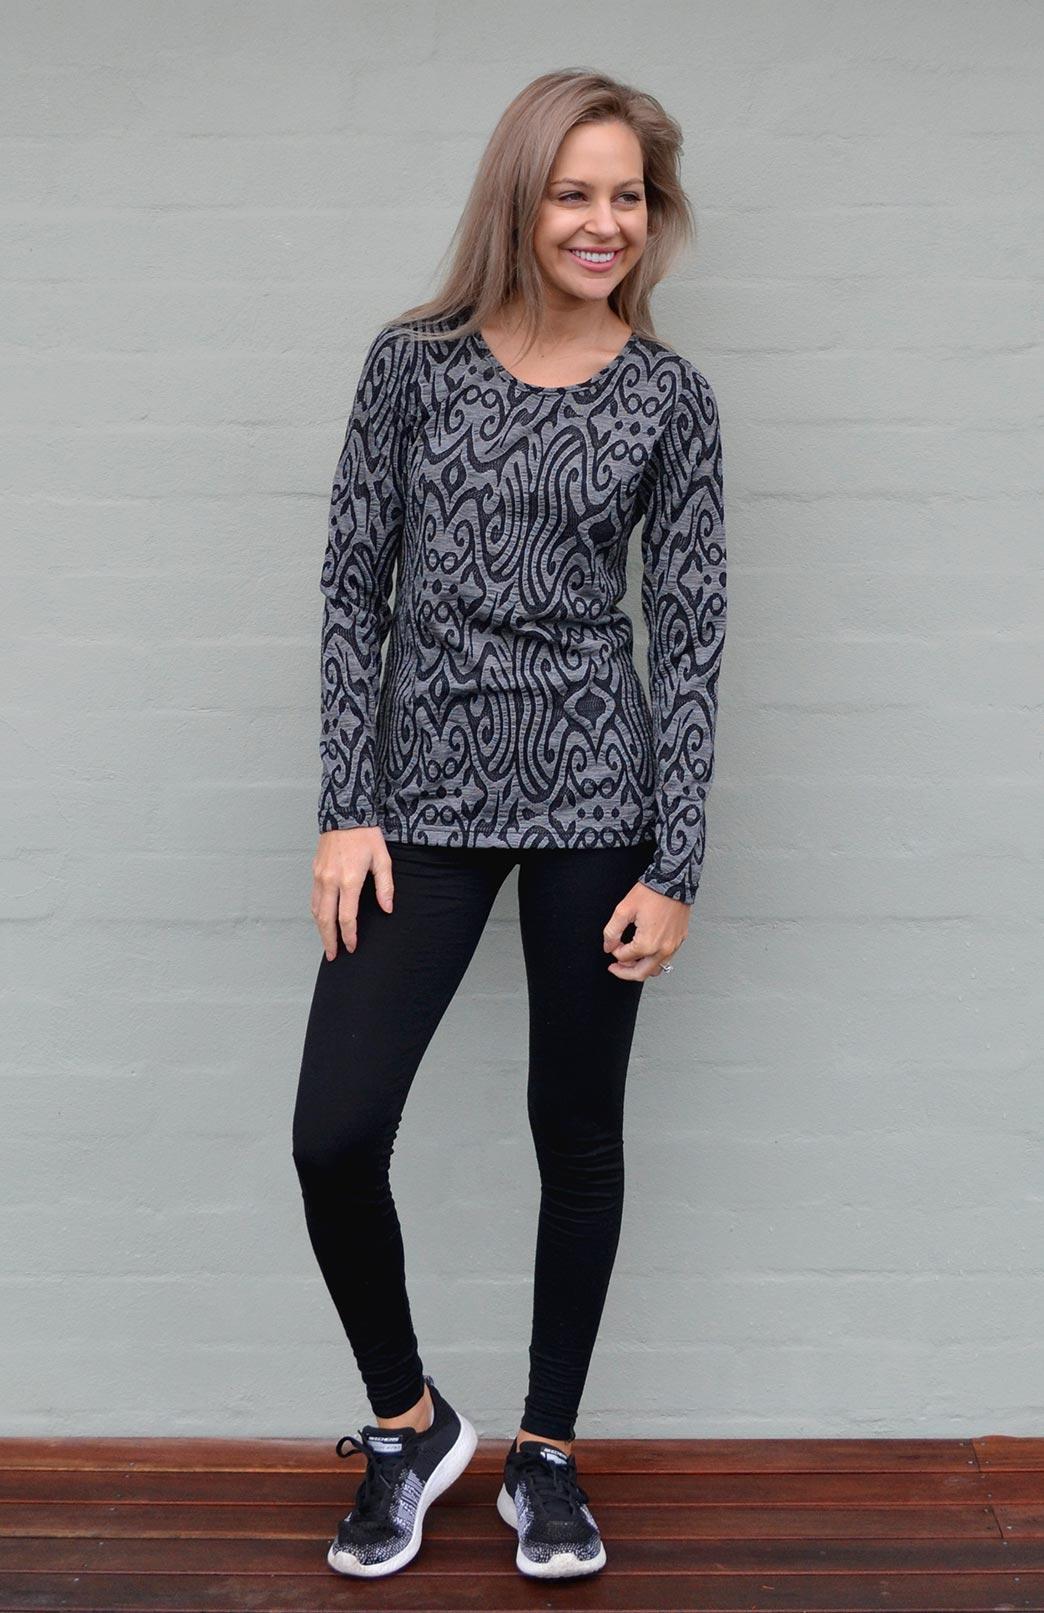 Round Neck Top - Patterned - Women's Black and Grey Inca Swirl Patterned Long Sleeve Merino Wool Thermal Fashion Top - Smitten Merino Tasmania Australia